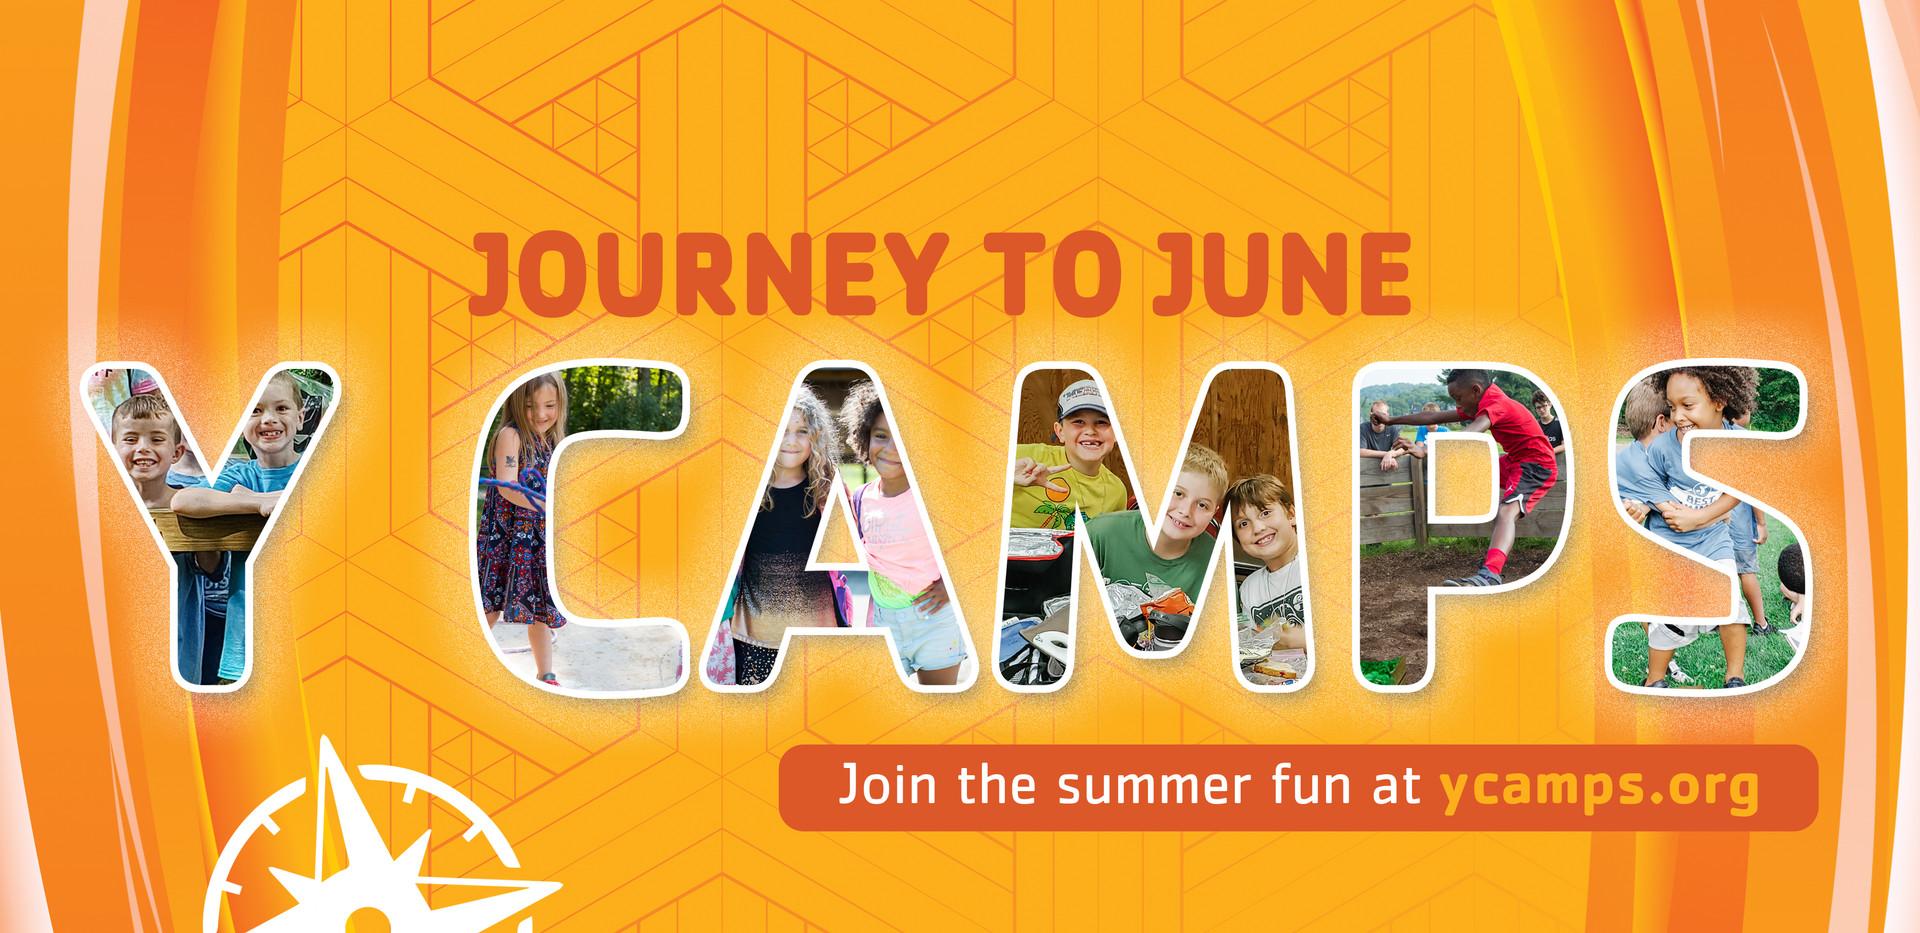 Journey to June